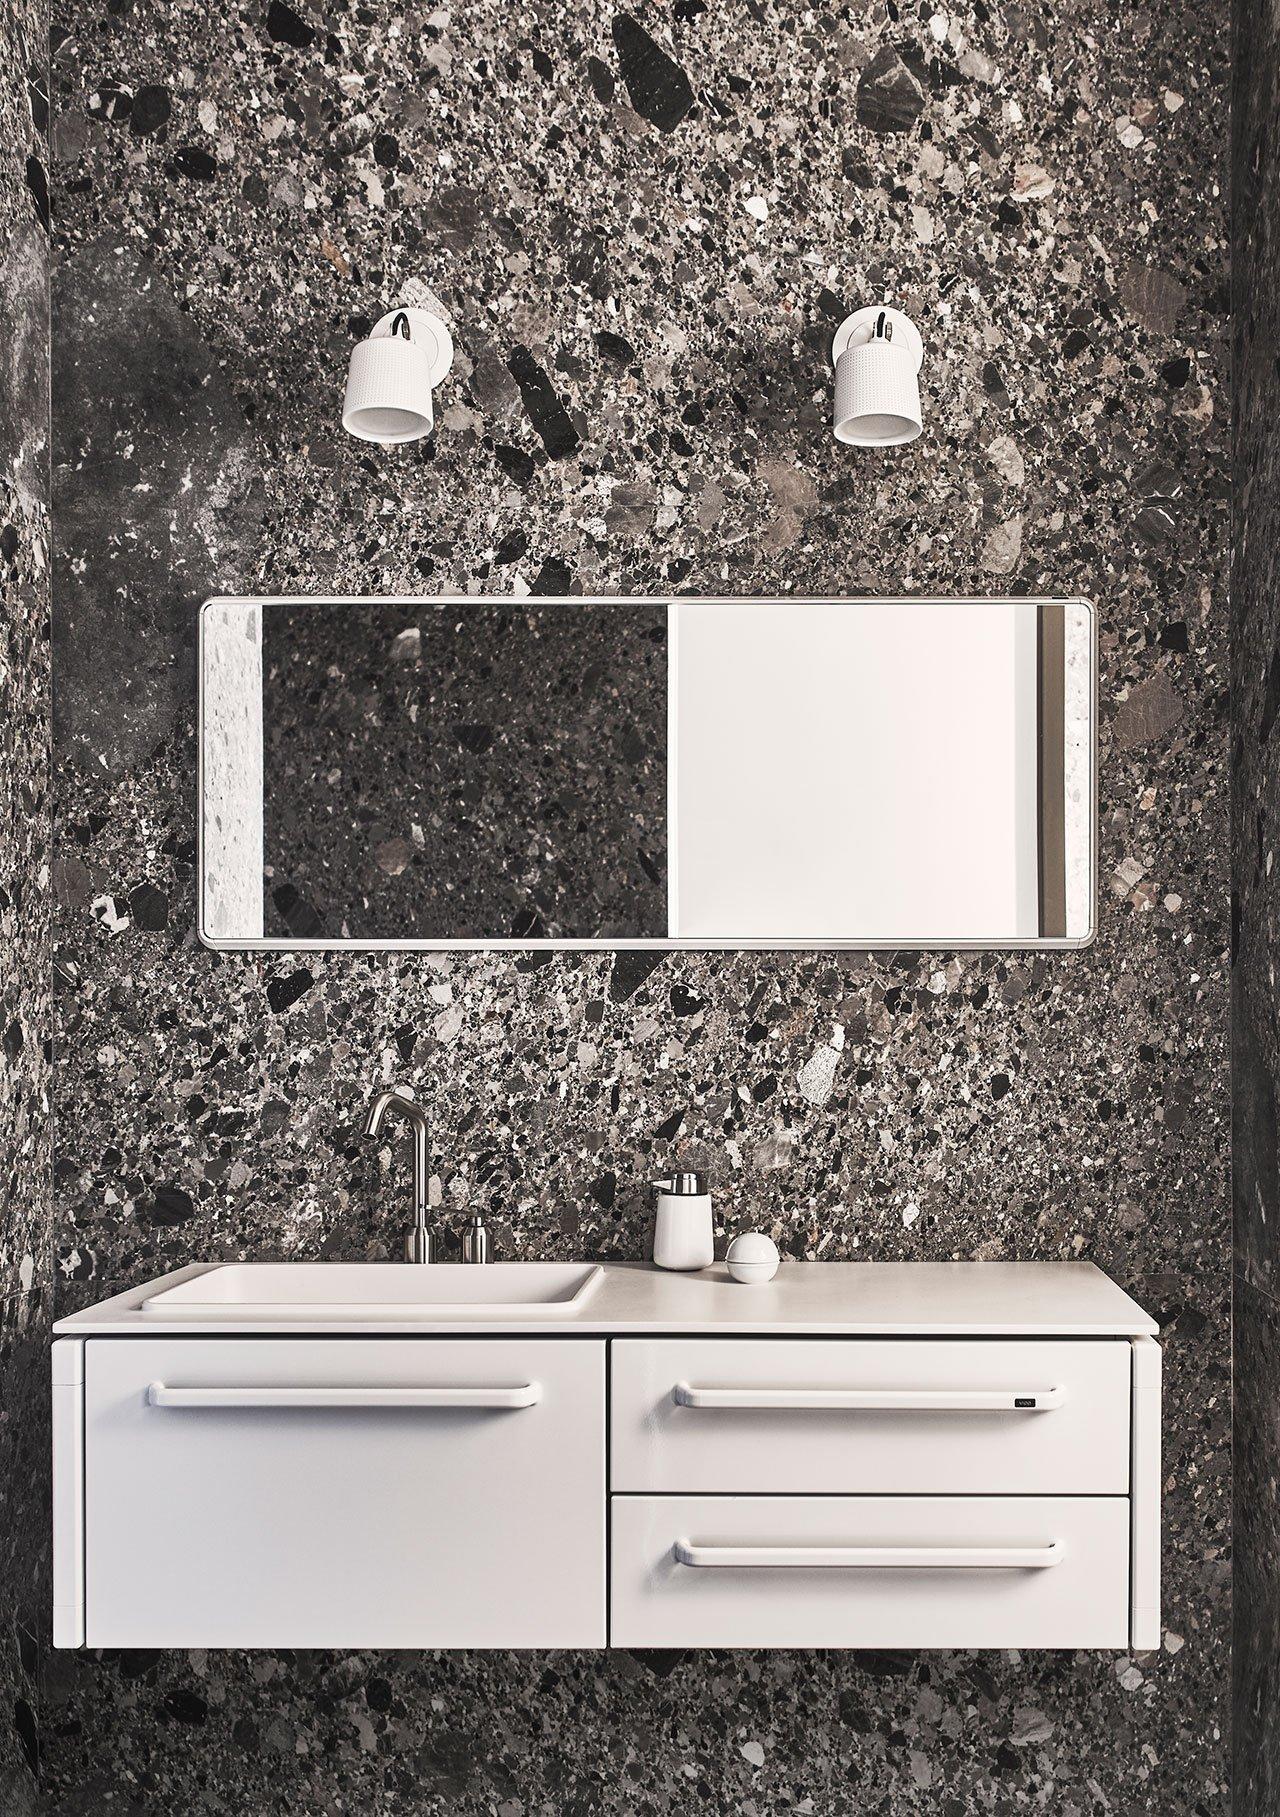 Photography by Adrian Gaut.Styling by Colin King. © Vipp Second bathroom: Ceppo stone, Vipp Bathroom Module, medium, Vipp Bathroom Mirror, large, Vipp Spot Lights.